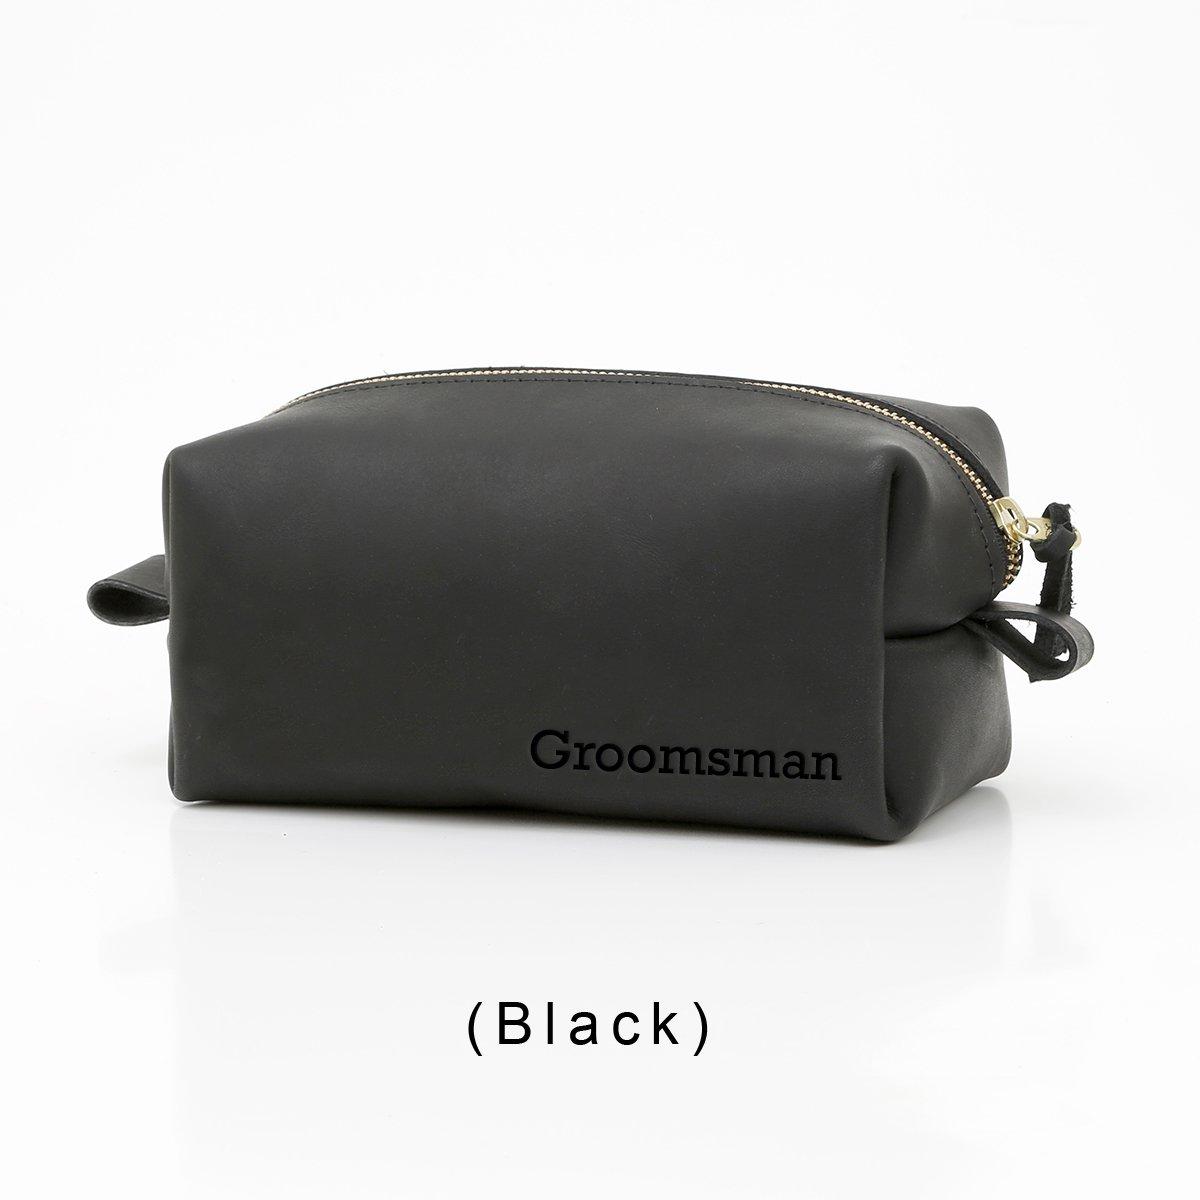 27c7e59ece8c Amazon.com   Personalized Leather Toiletry Bag